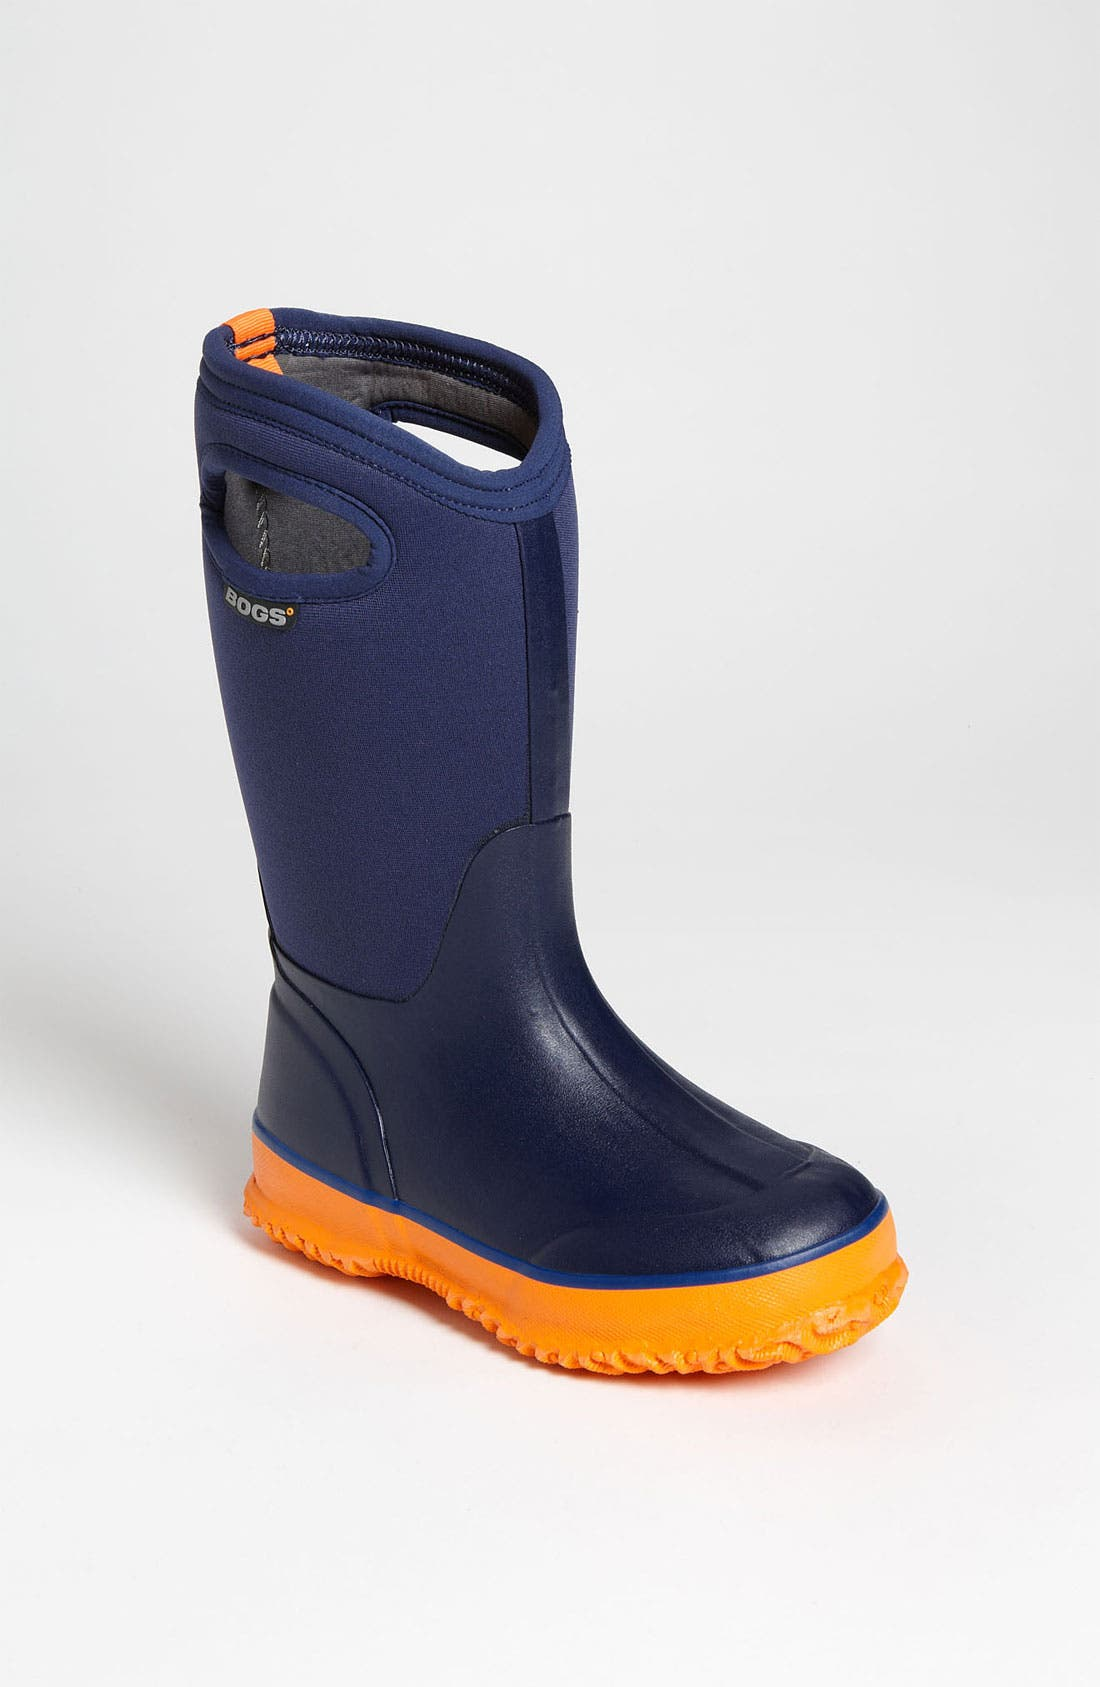 Alternate Image 1 Selected - Bogs 'Classic High' Waterproof Boot (Toddler, Little Kid & Big Kid)